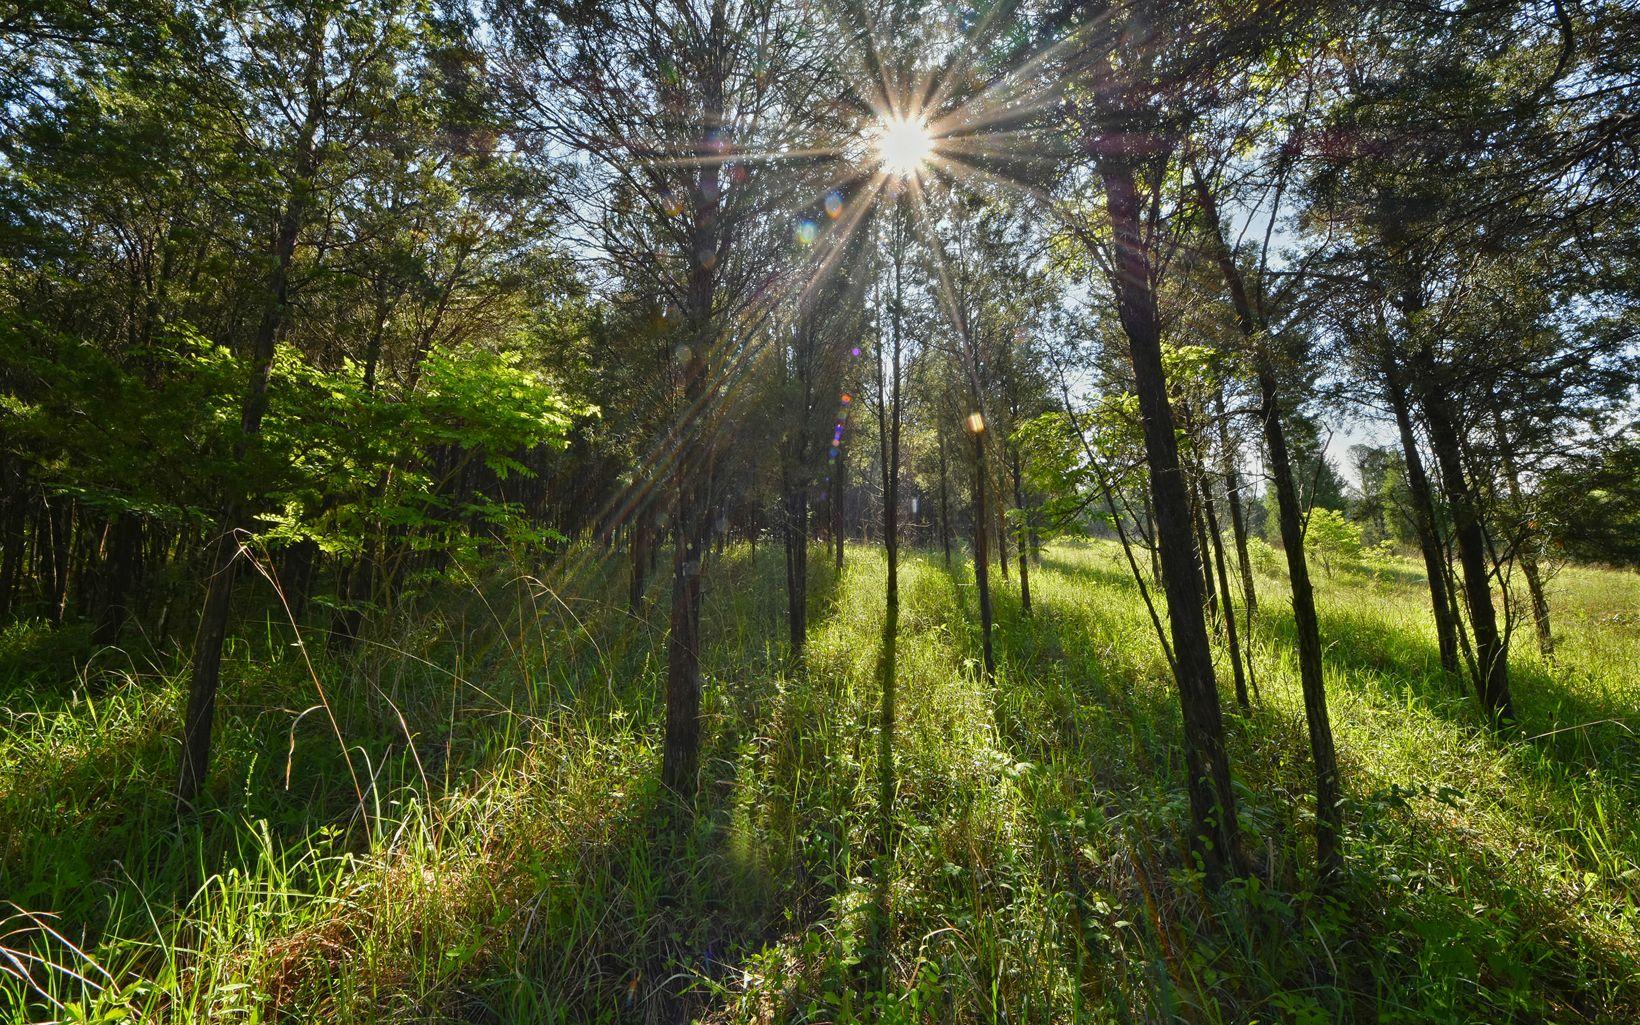 Picturesque view at the Joan Jones Portman Trail